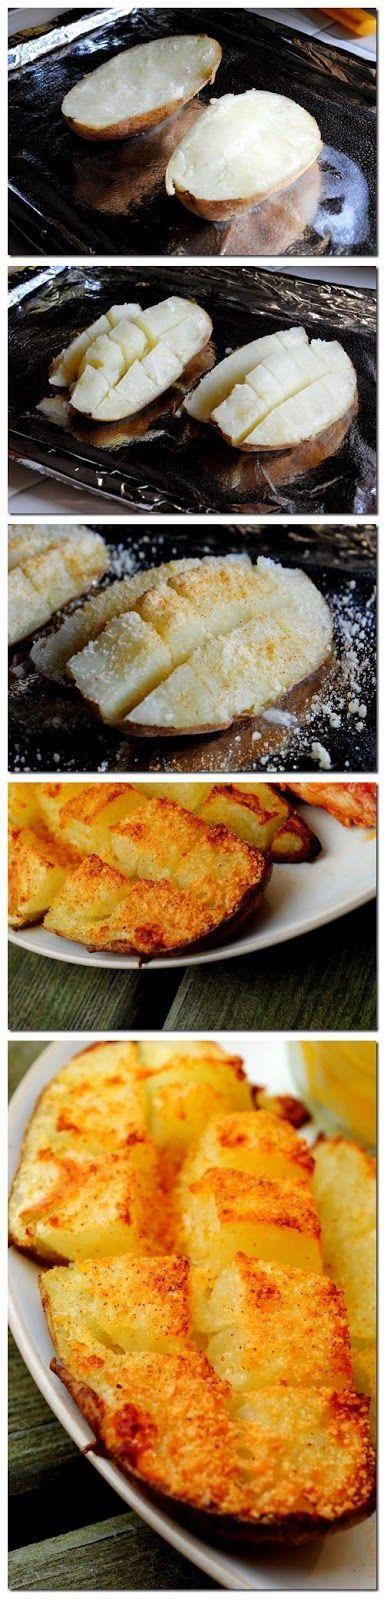 Seasoned Roasted Potatoes - Joybx